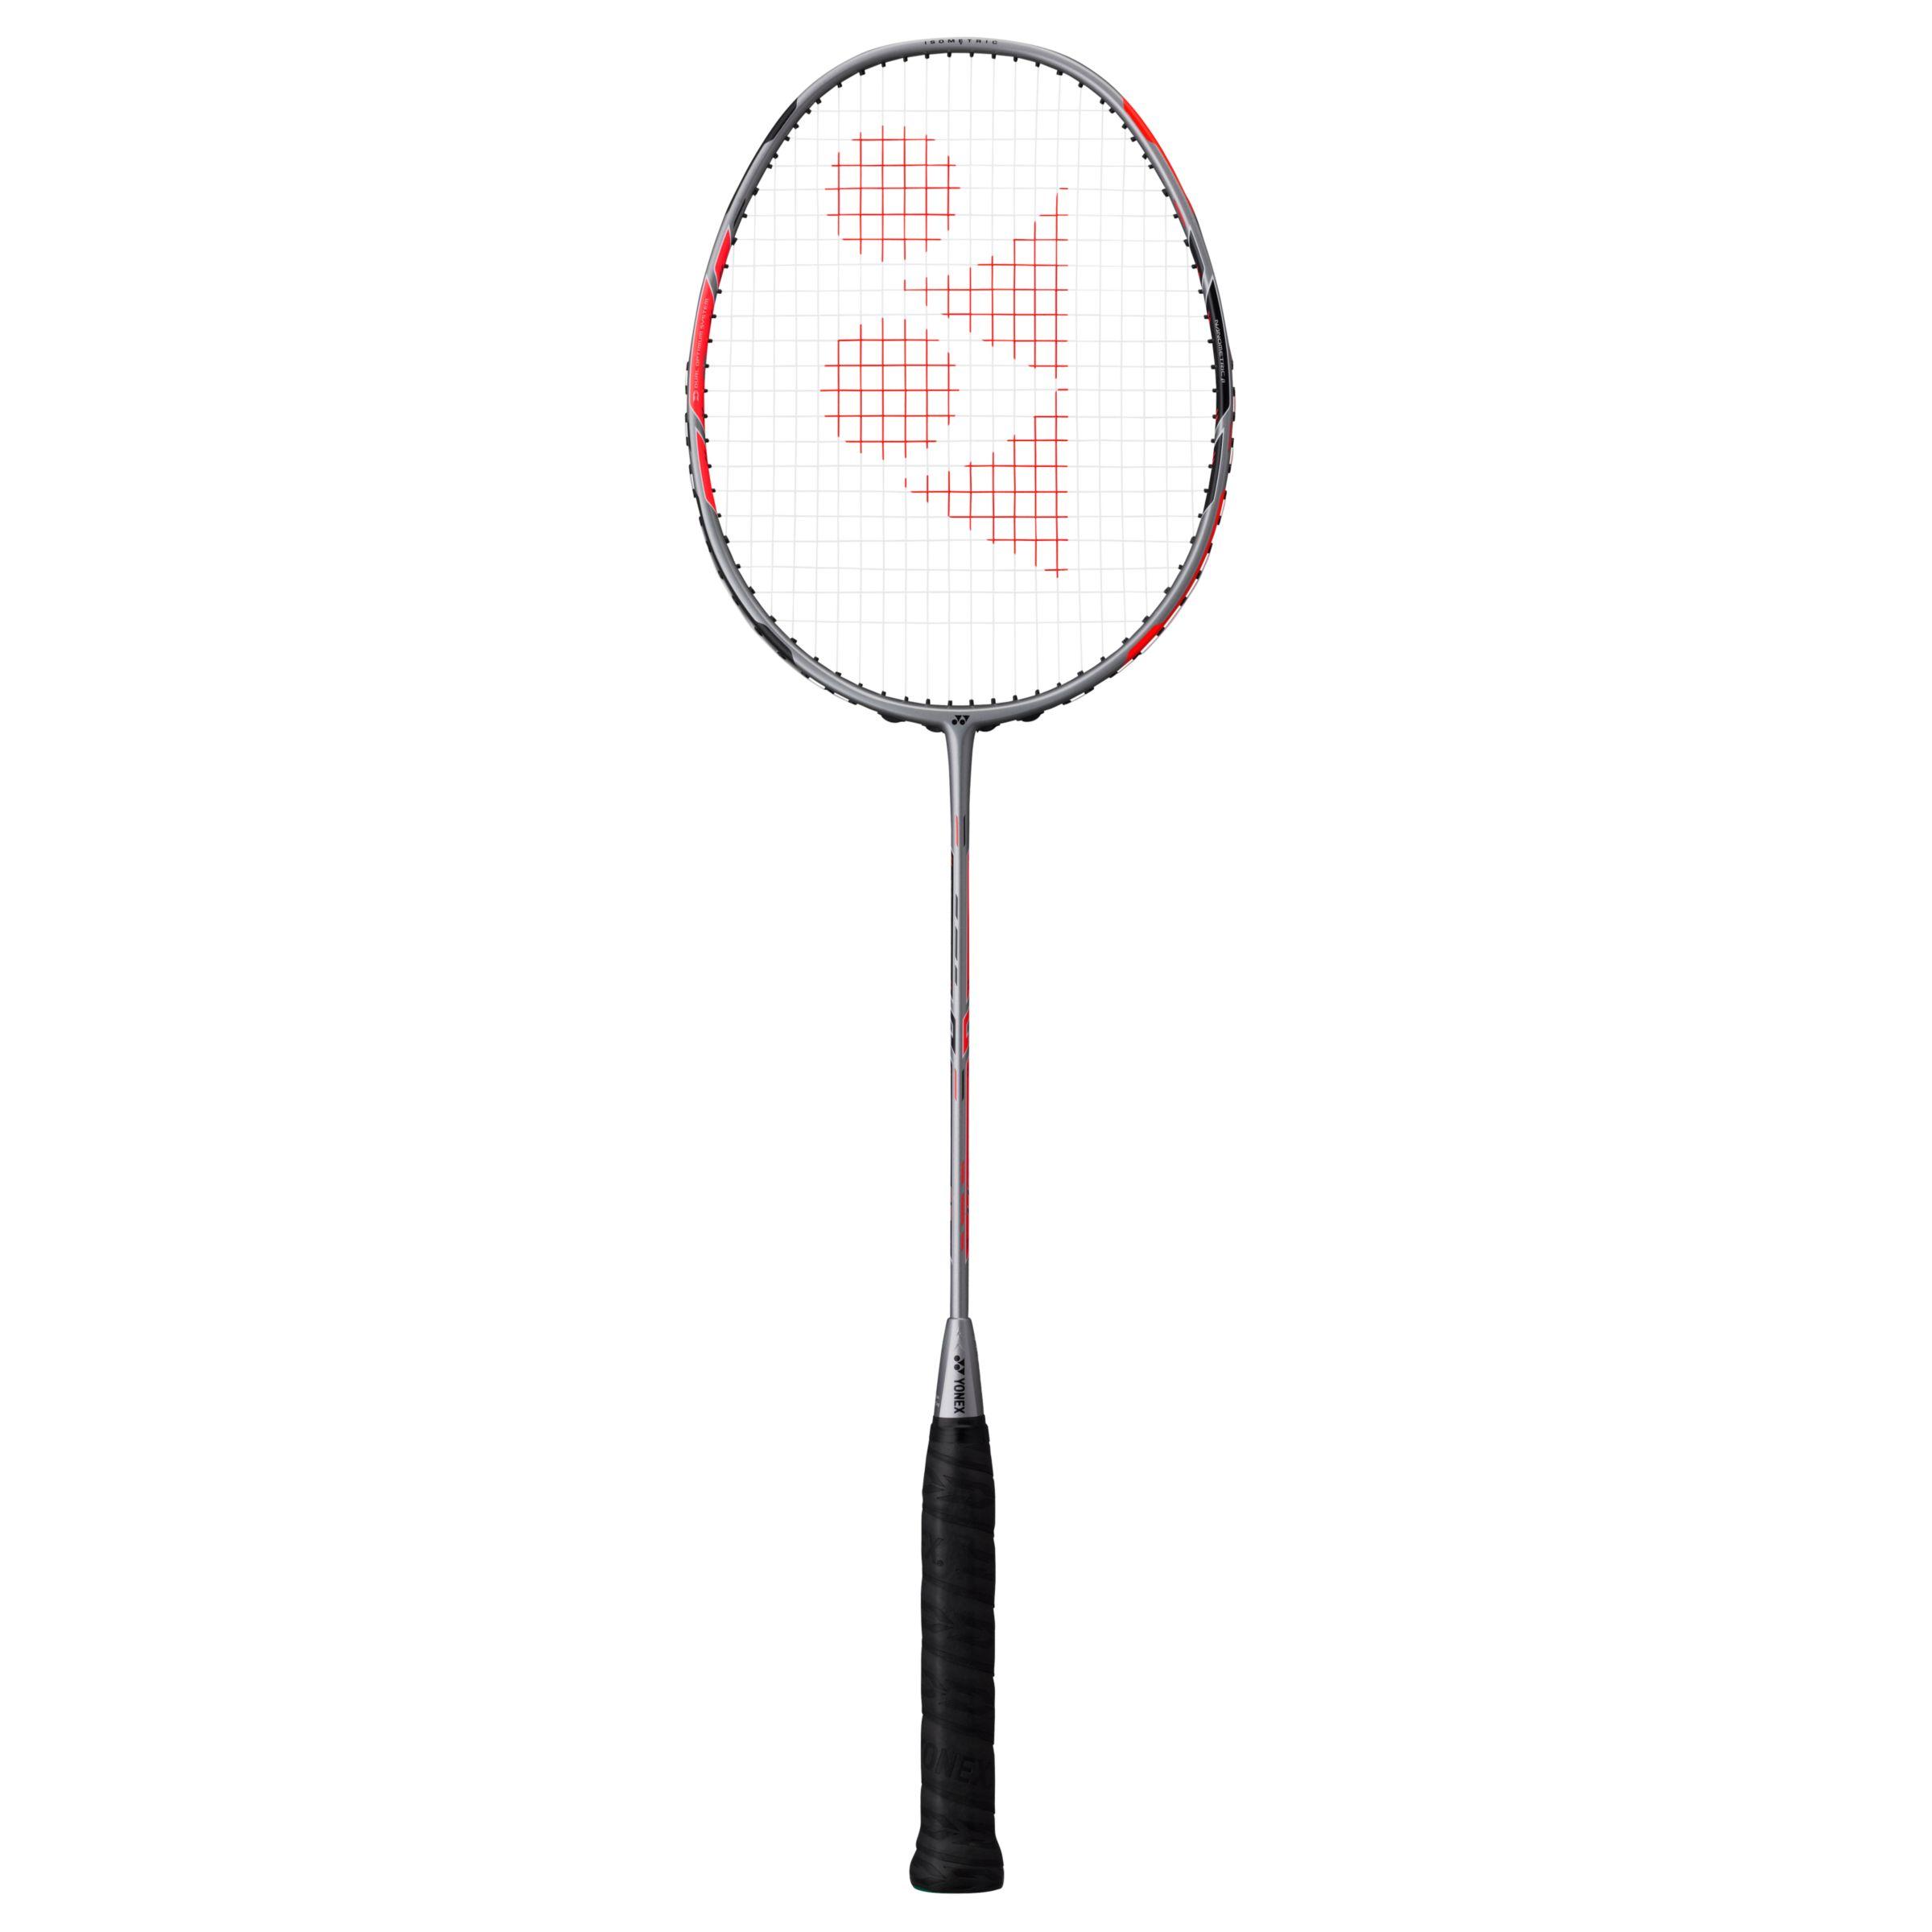 Yonex Yonex Duora 77 Badminton Racquet, Silver/Black/Red